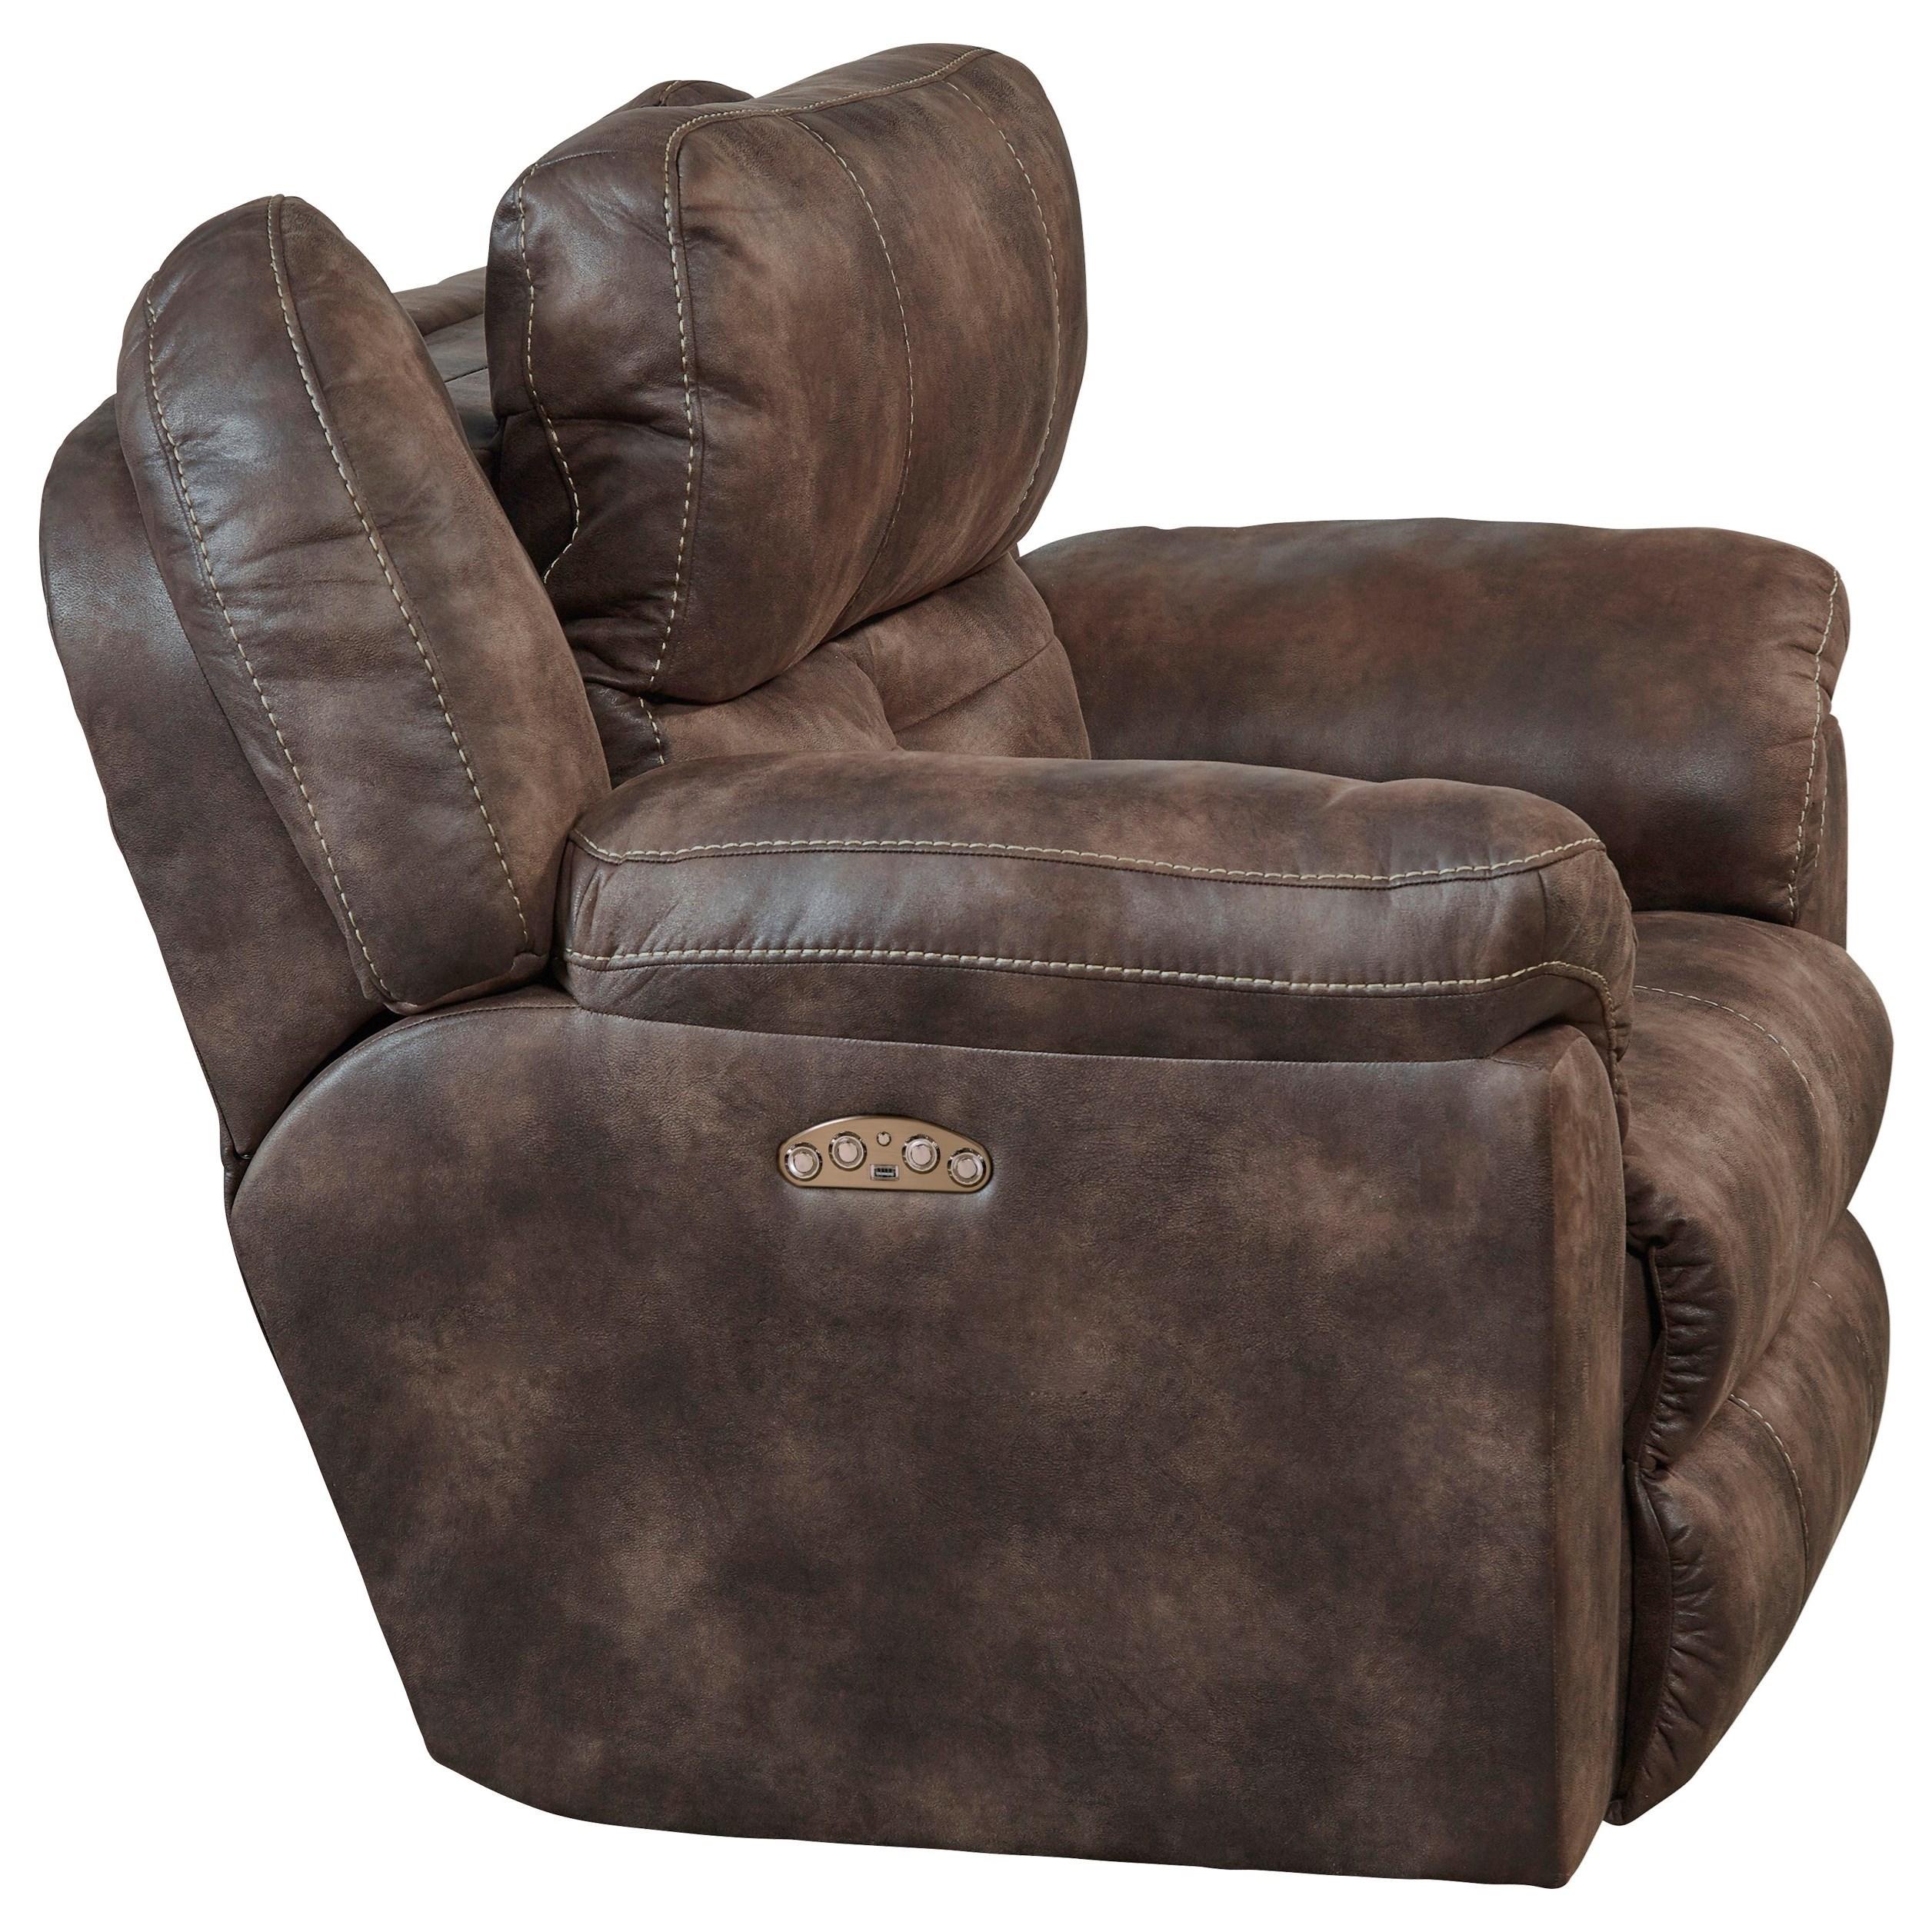 Ferrington Power Lay Flat Reclining Living Room Set Dusk: Catnapper Ferrington 61890-7 Power Headrest Lay Flat